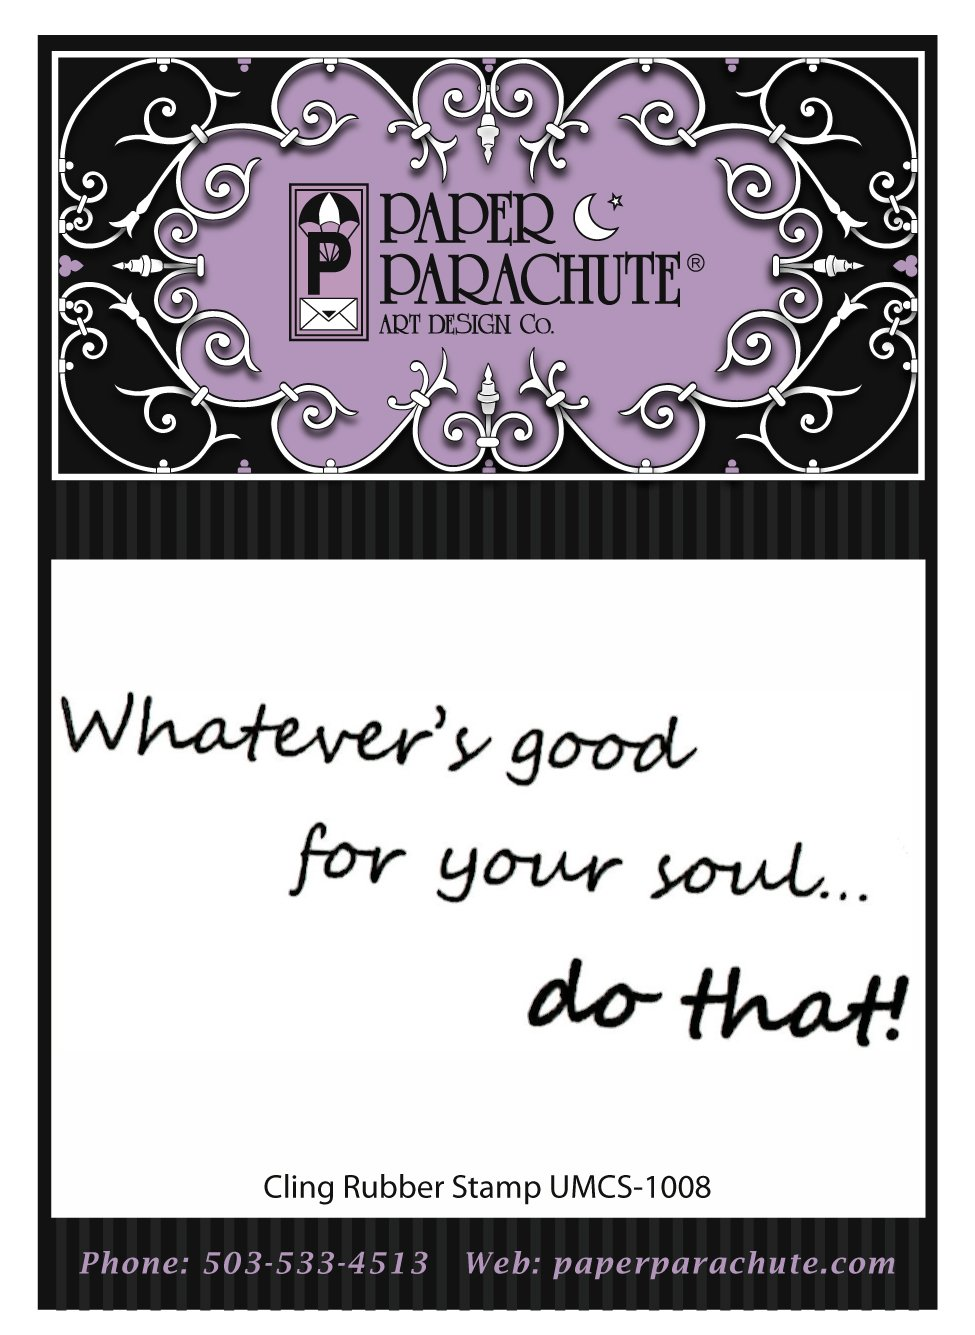 Paper Parachute Rubber Stamp - UMCS1008